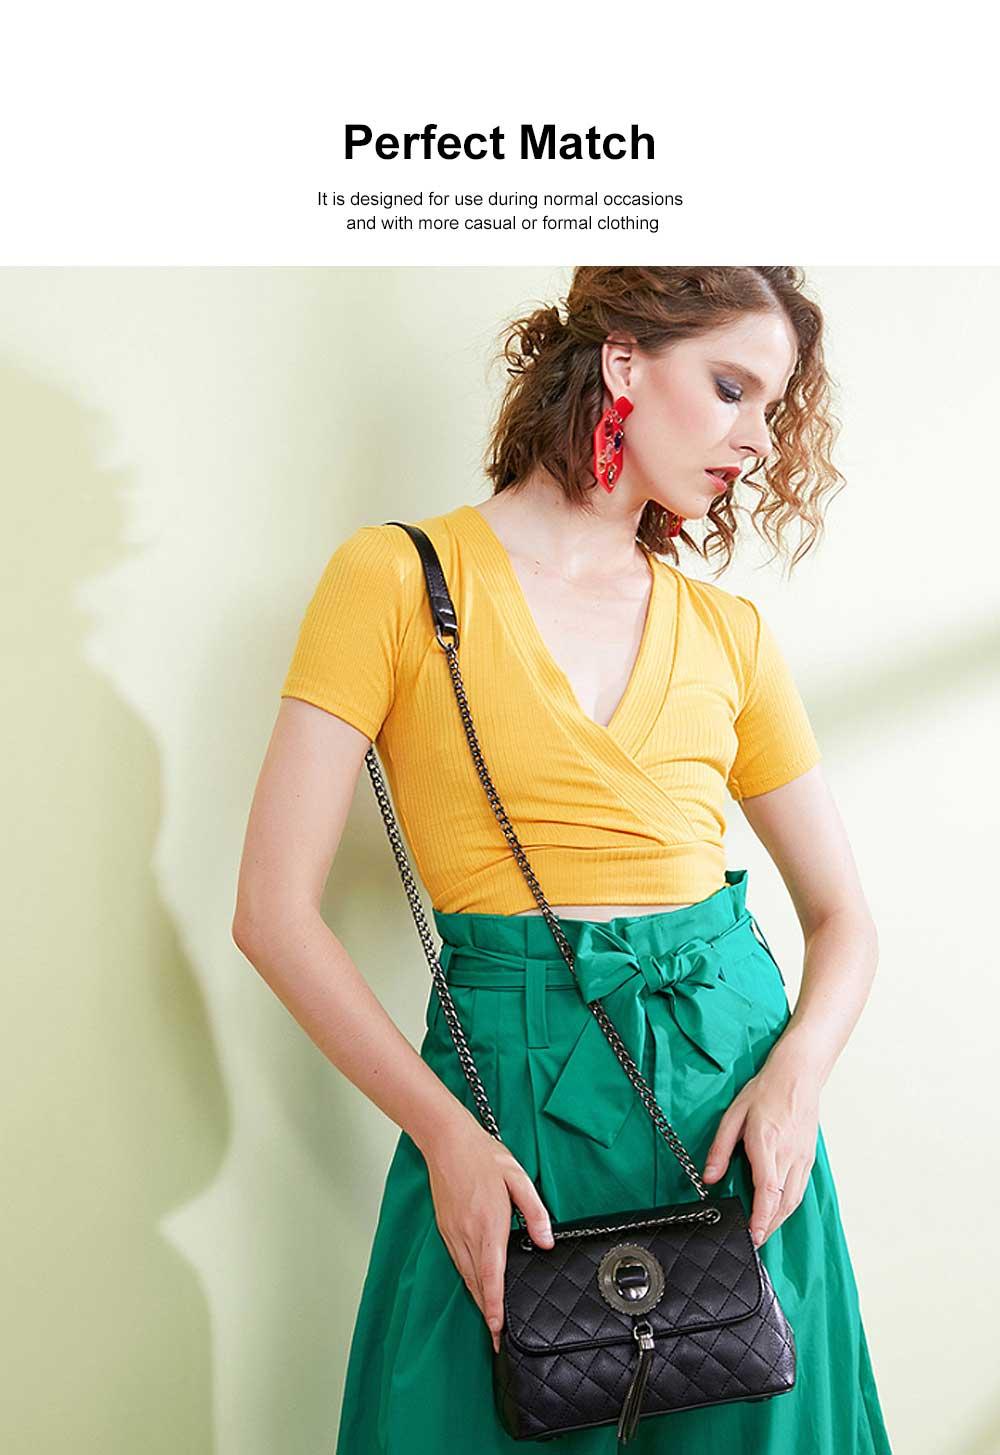 Women Shoulder Bag Fashion Mini Cross-Body Bag Wedding Party Handbag Classic Style for Women Girls 2